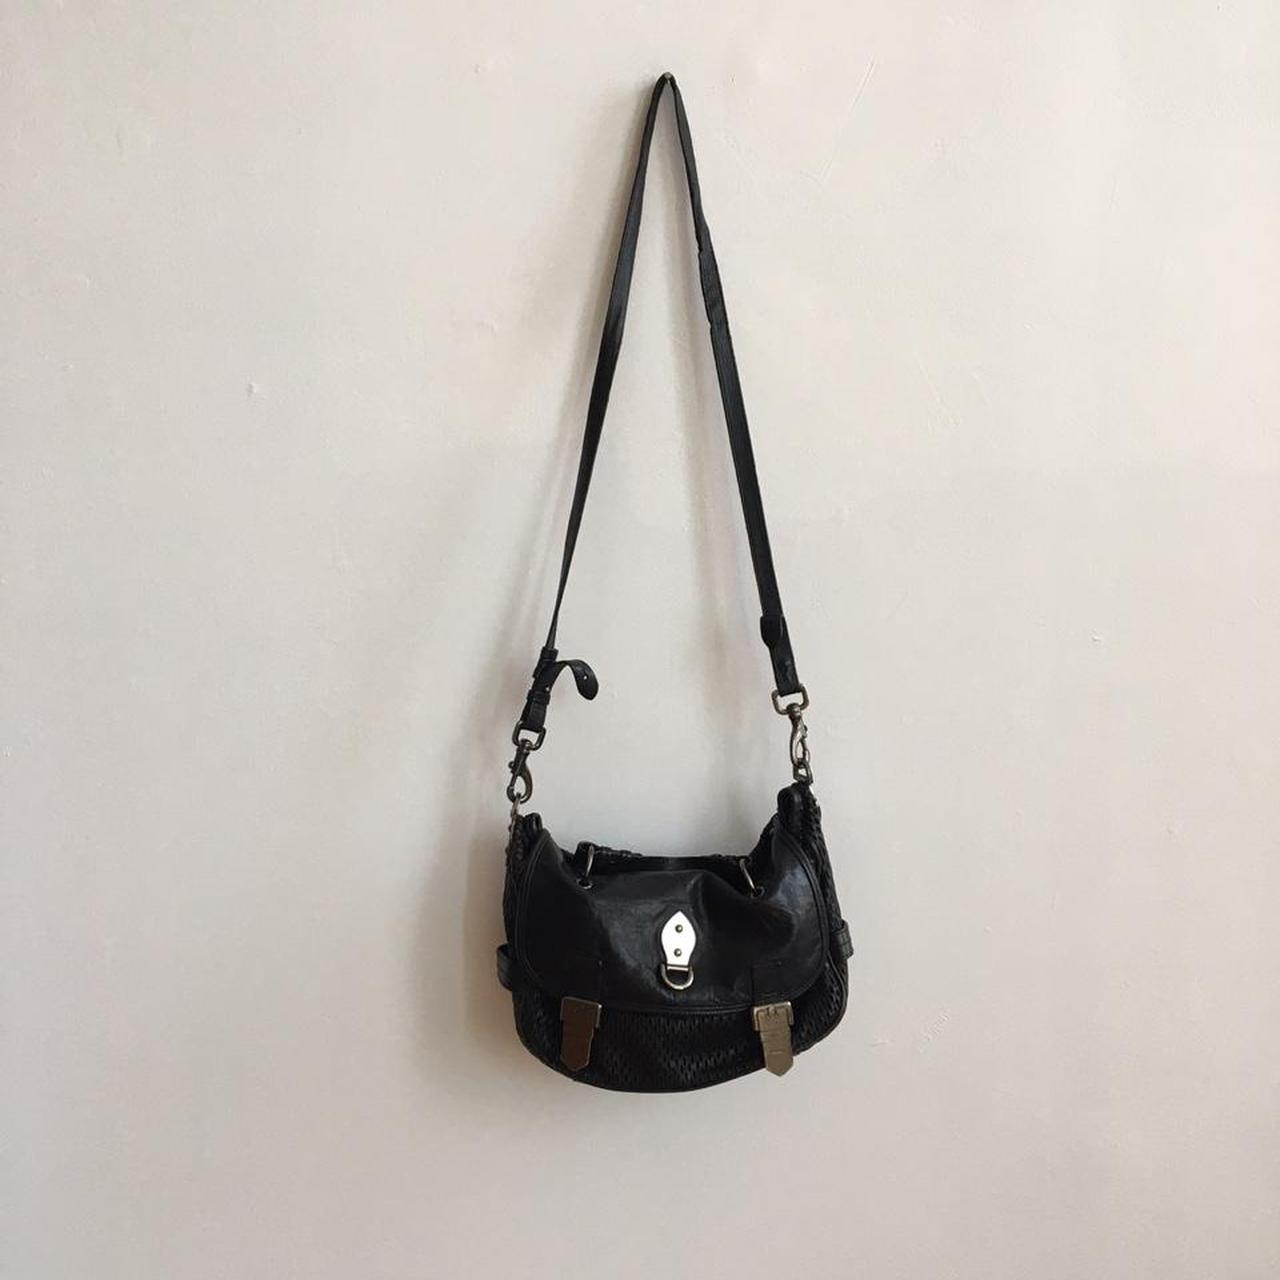 Product Image 1 - Mulberry black leather messenger back Super